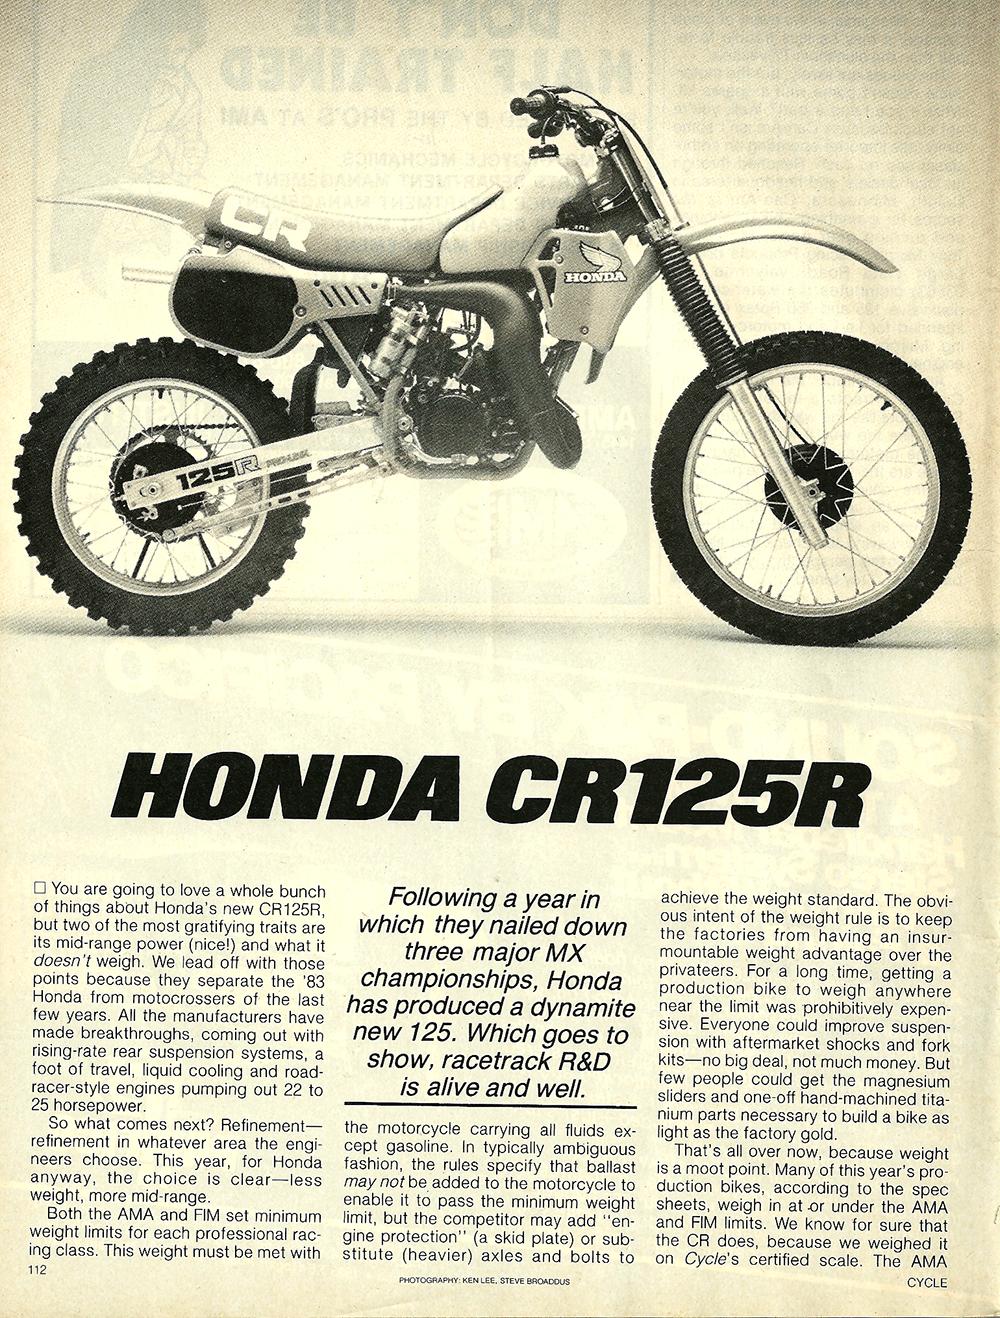 1983 Honda CR125R road test 1.jpg